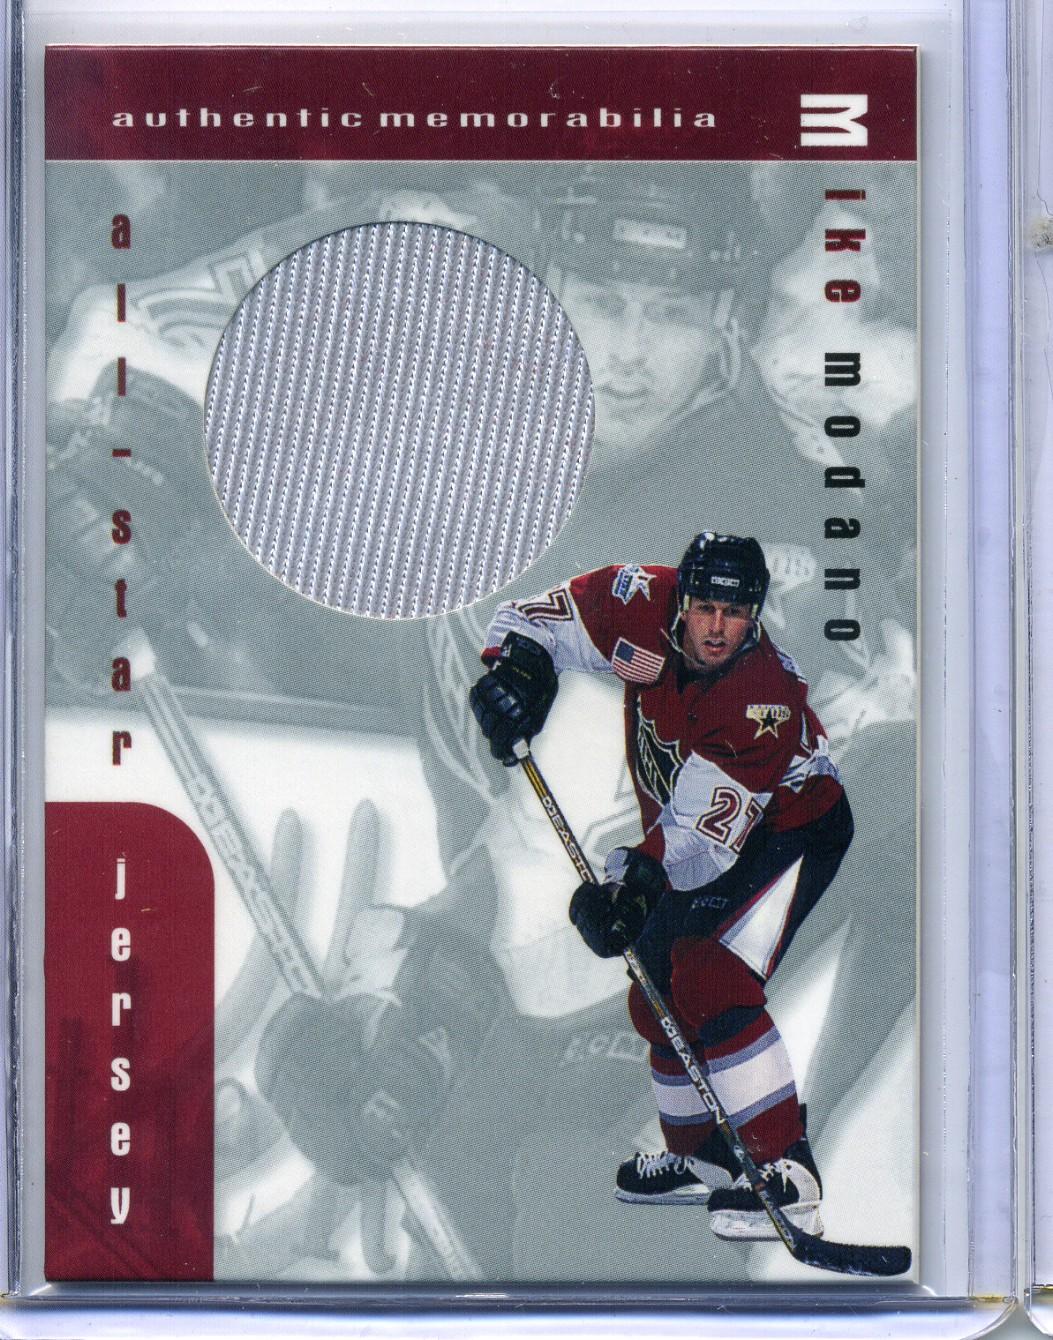 1999-00 BAP Memorabilia Jersey #J4 Mike Modano